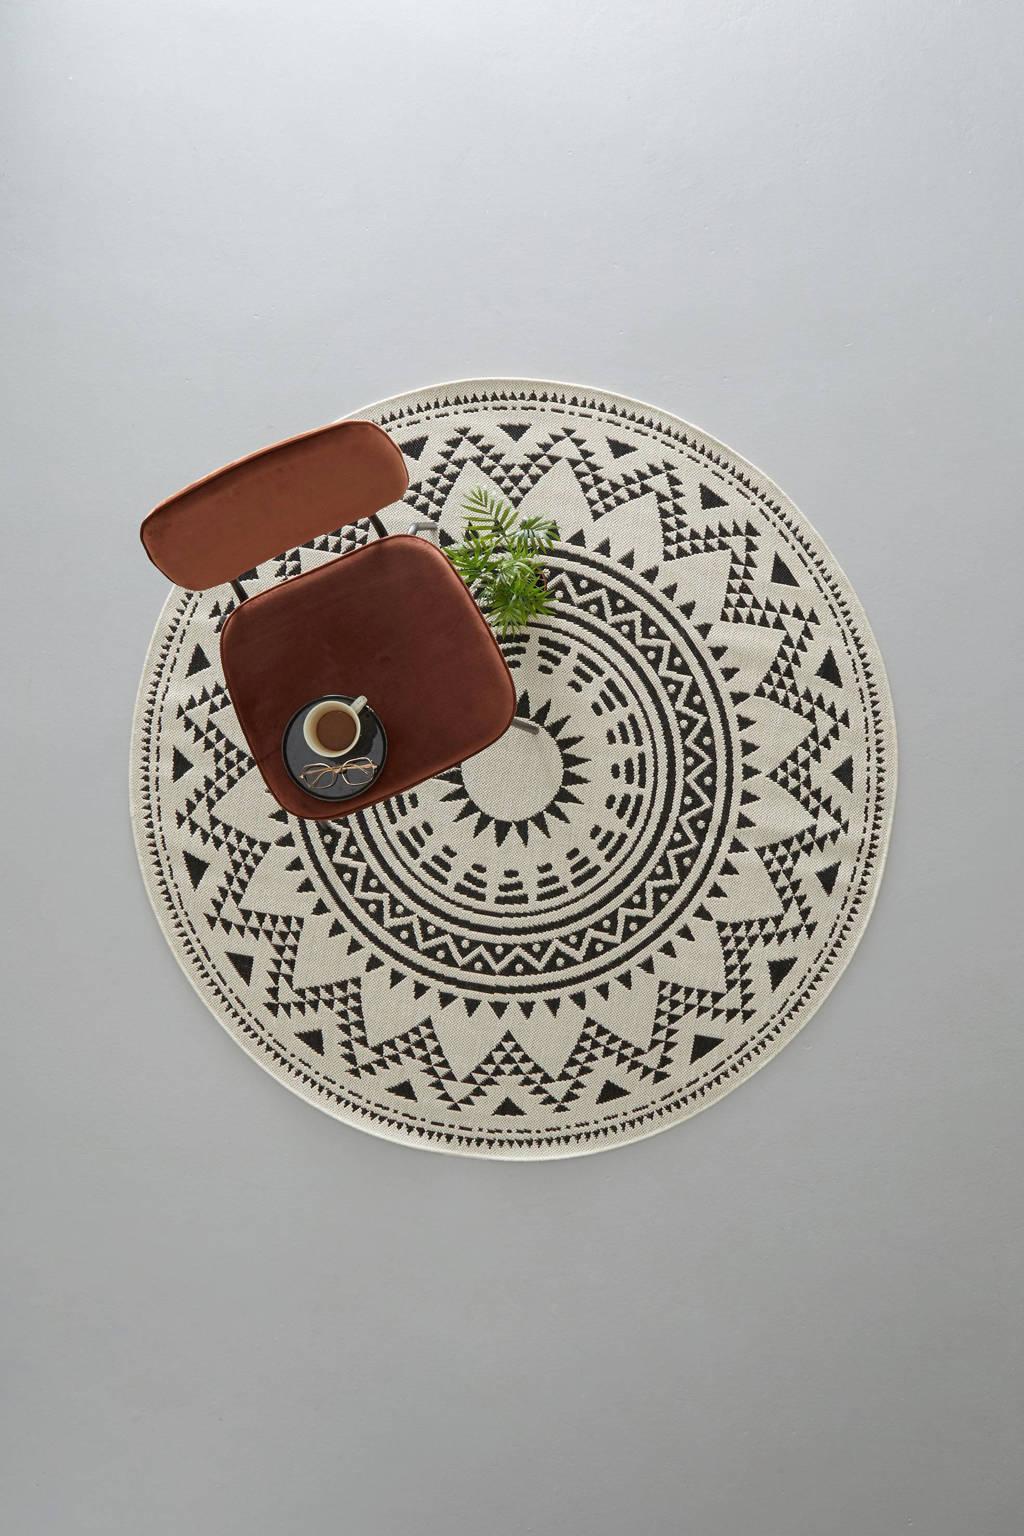 whkmp's own binnen- en buitenvloerkleed  (Ø160 cm), Zwart/wol